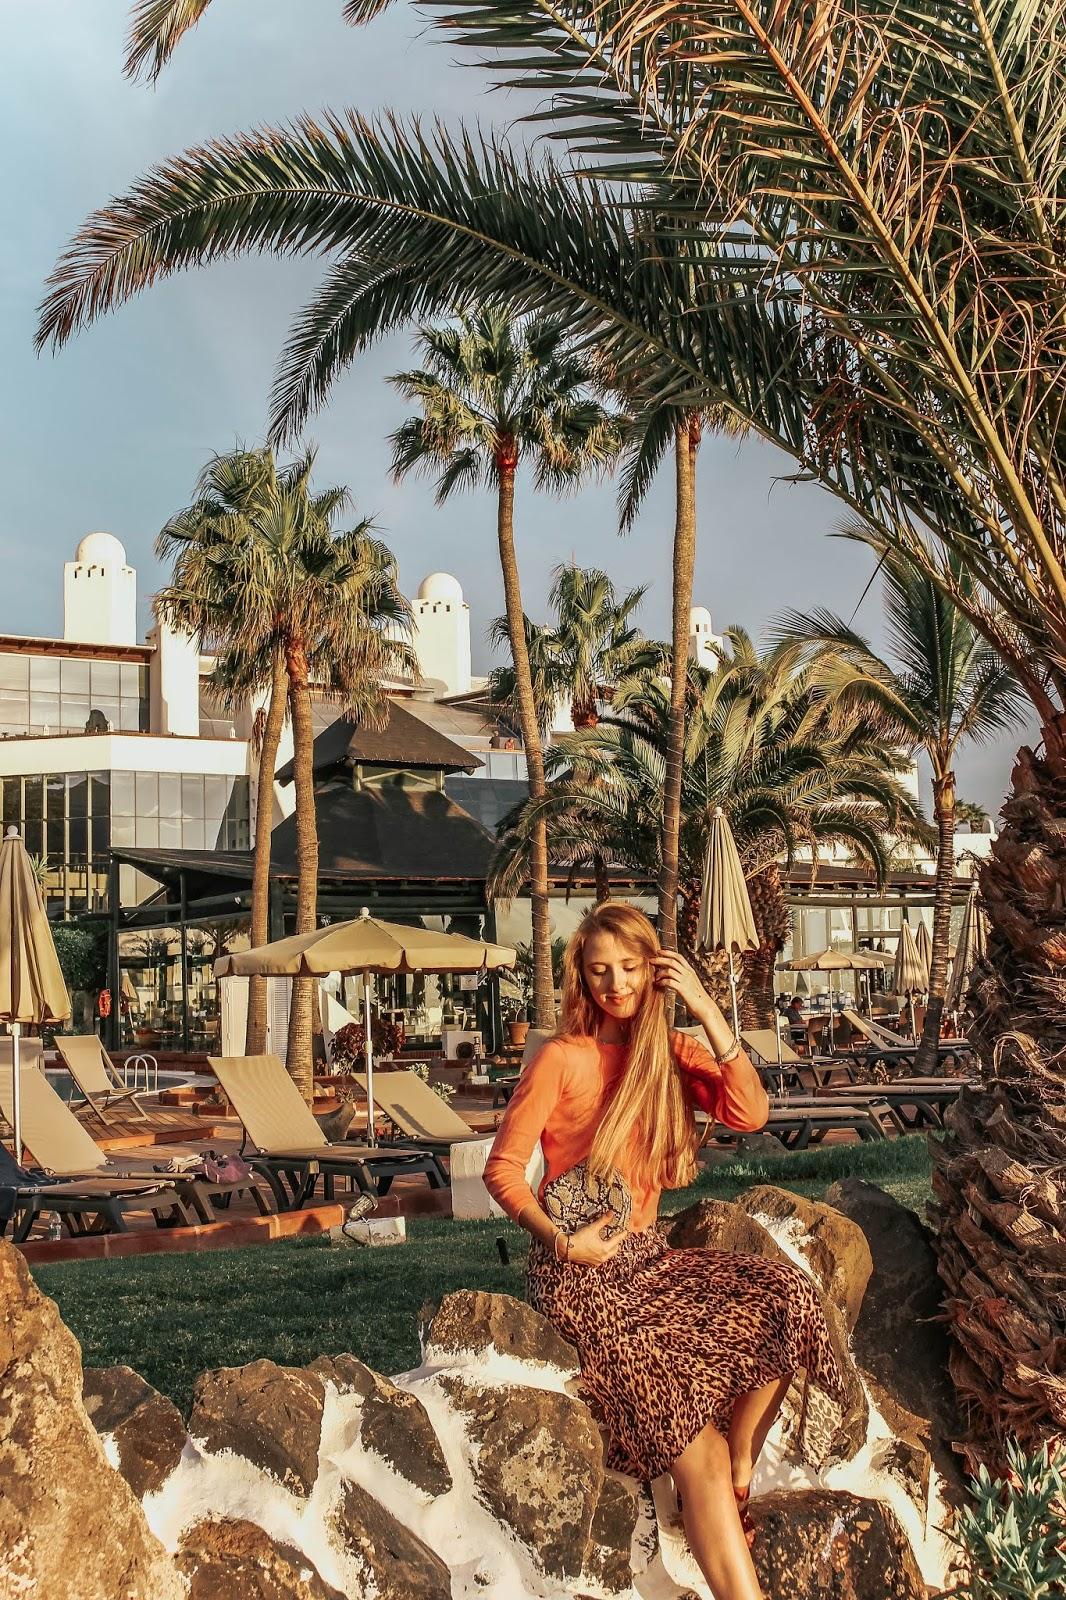 Lanzarote Playa Blanca Luxury Travel Guide